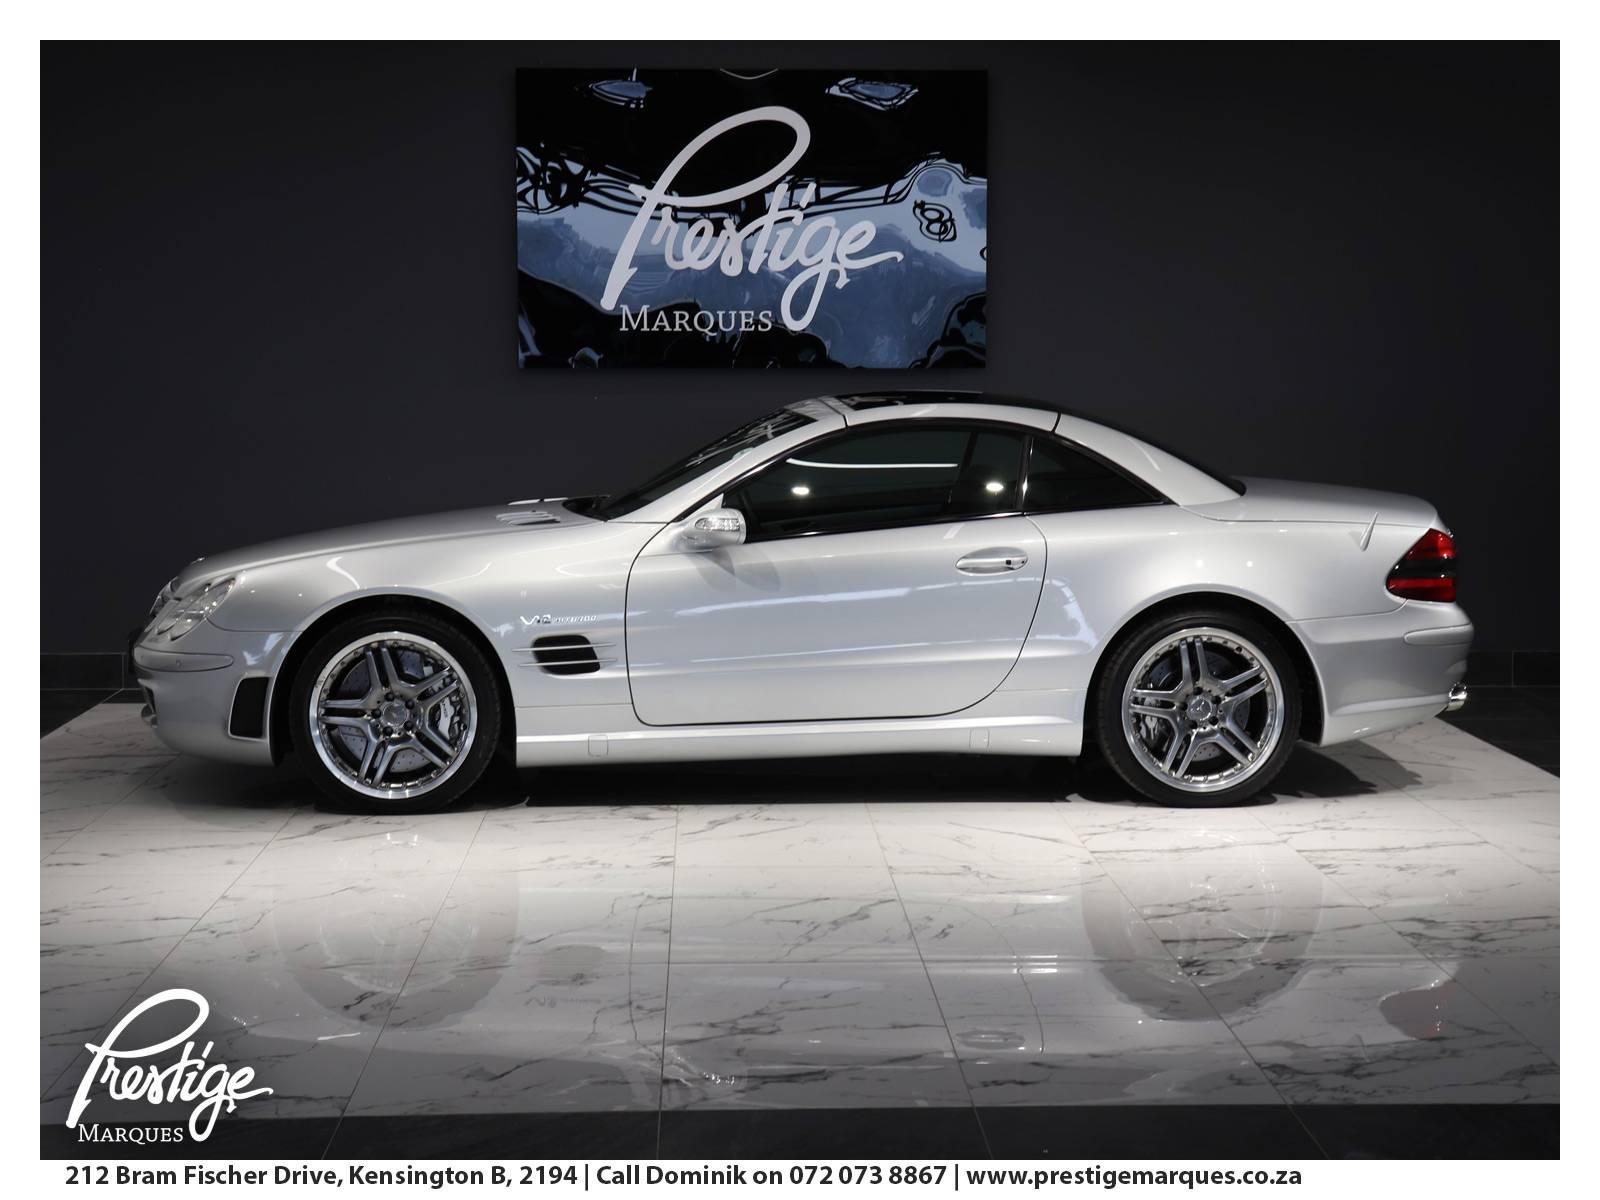 2006-Mercedes-Benz-SL65-AMG-Prestige-Marques-Randburg-Sandton-10